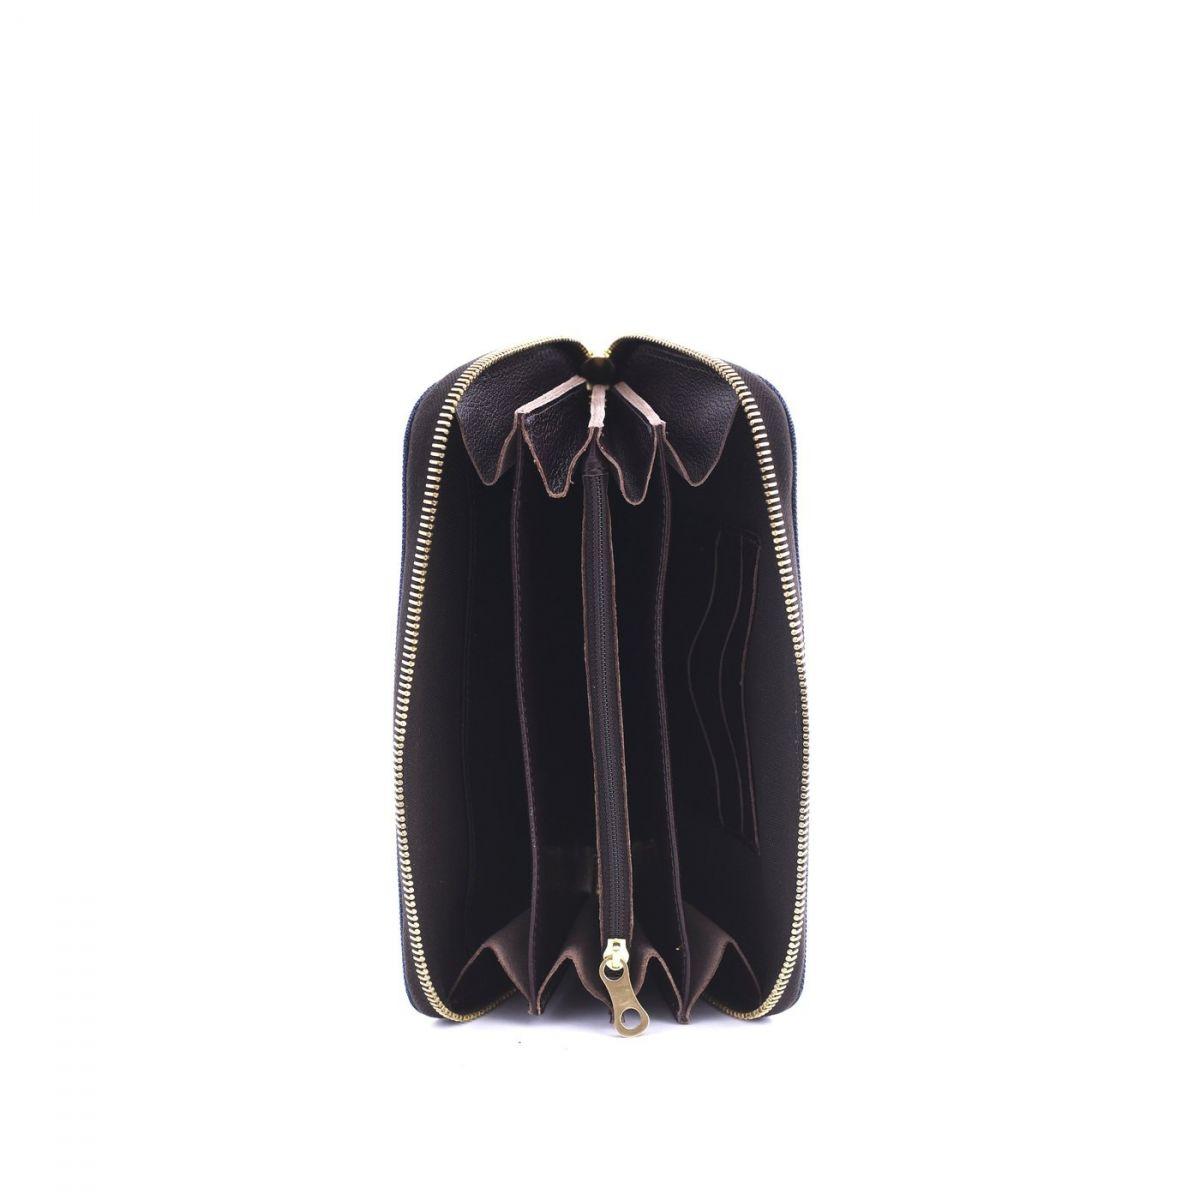 Wallet  in Nylon SMW086 color Blue Navy/Dark Brown | Details